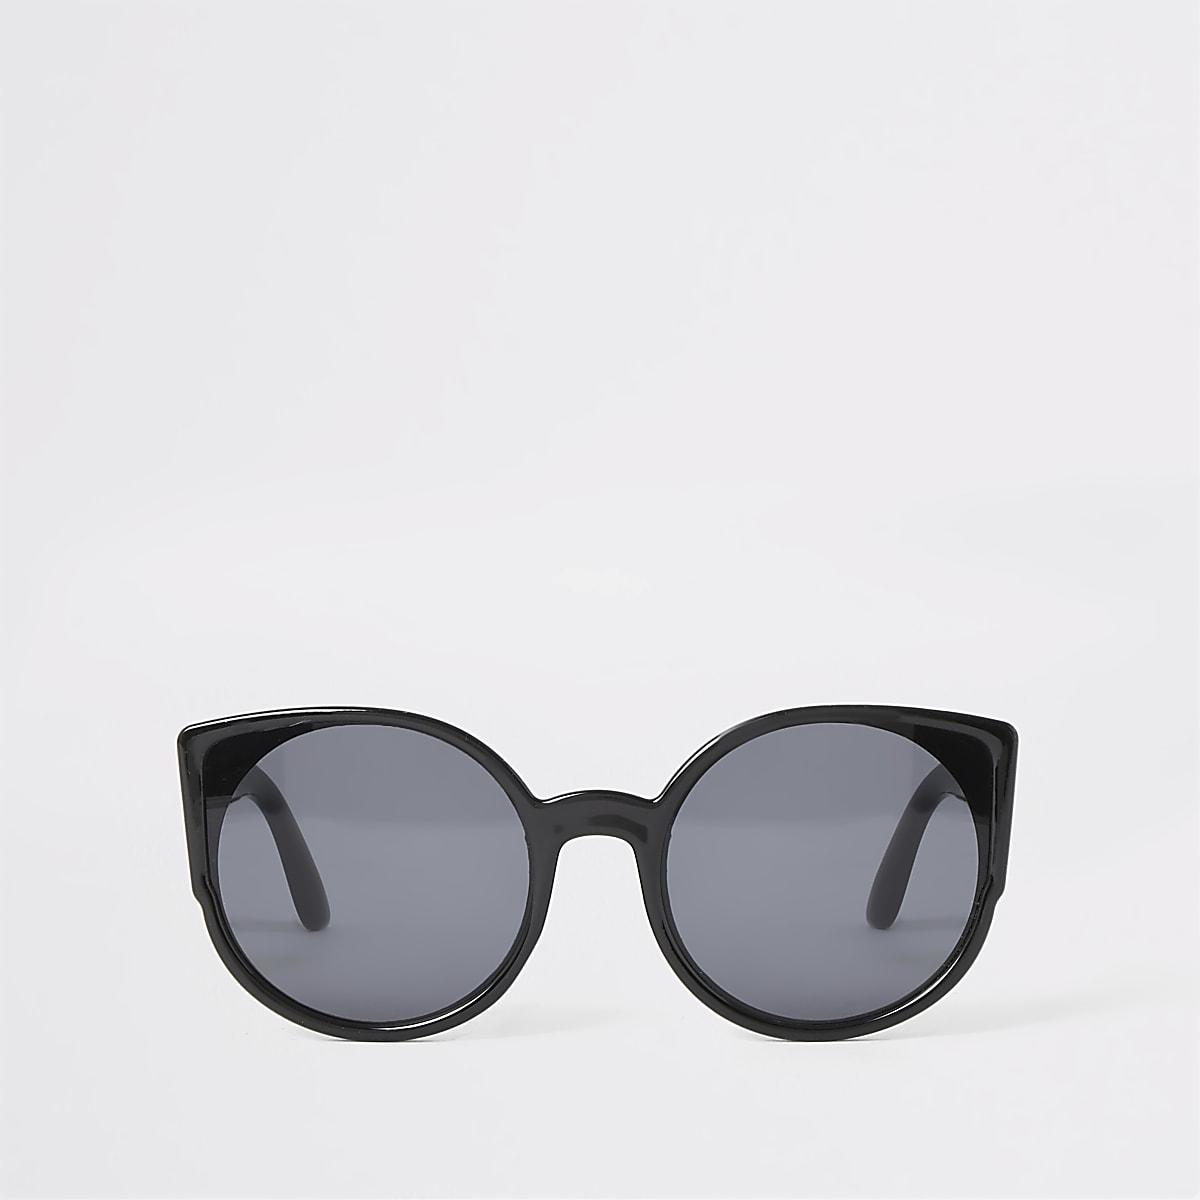 Girls black cat eye sunglasses